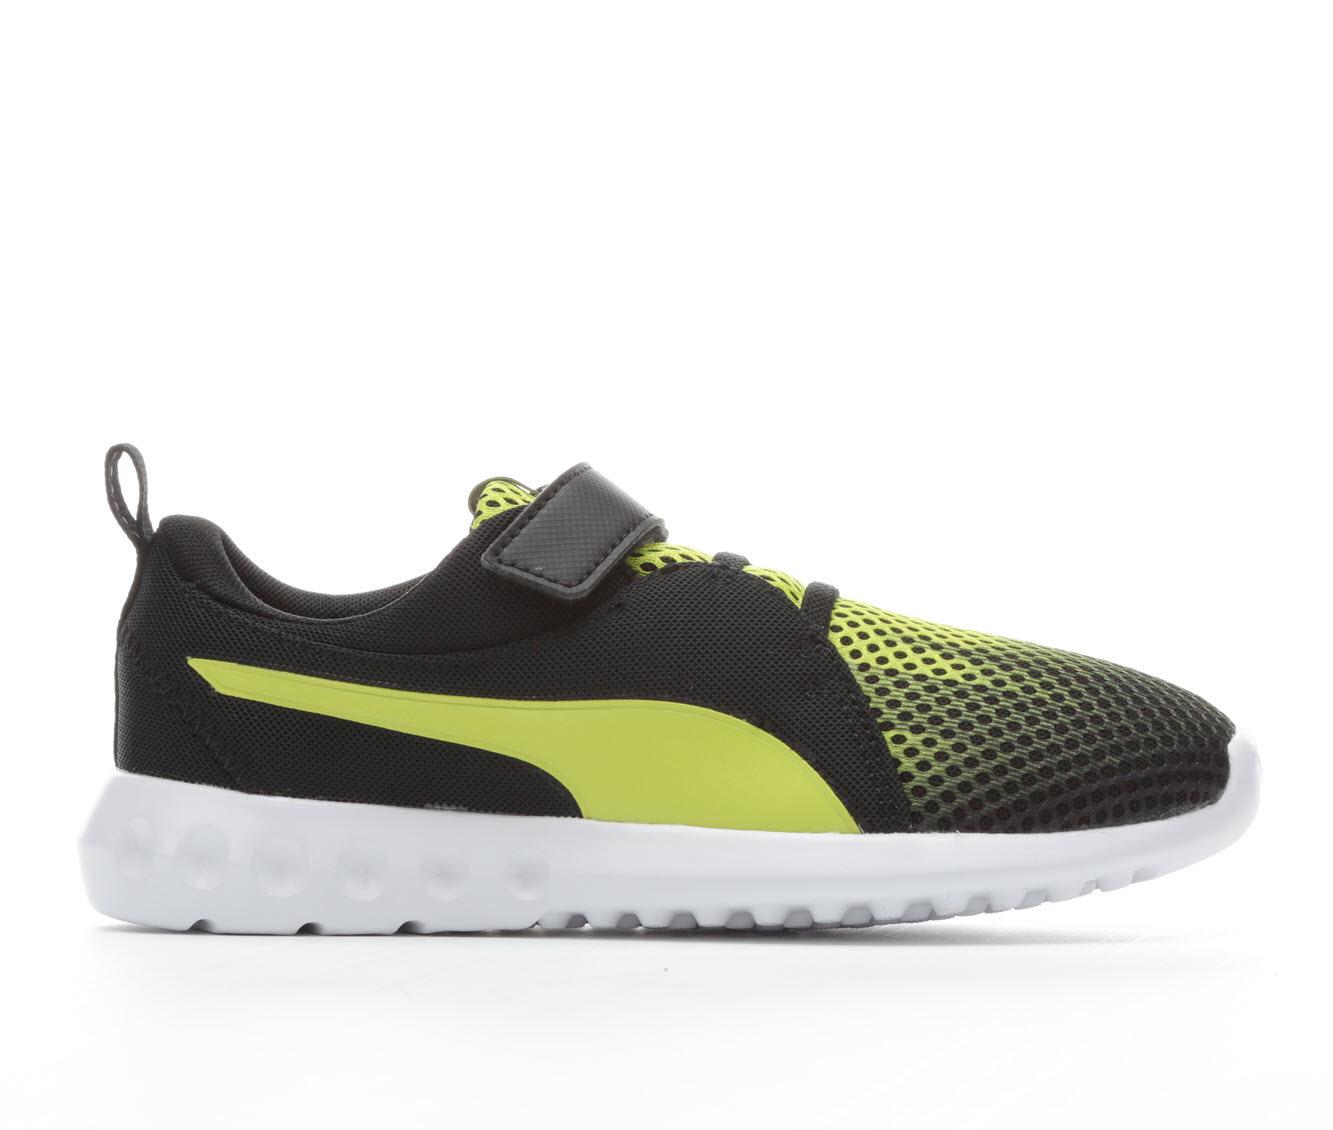 Boys' Puma Carson 2 Oxidized Velcro Running Shoes (Black)